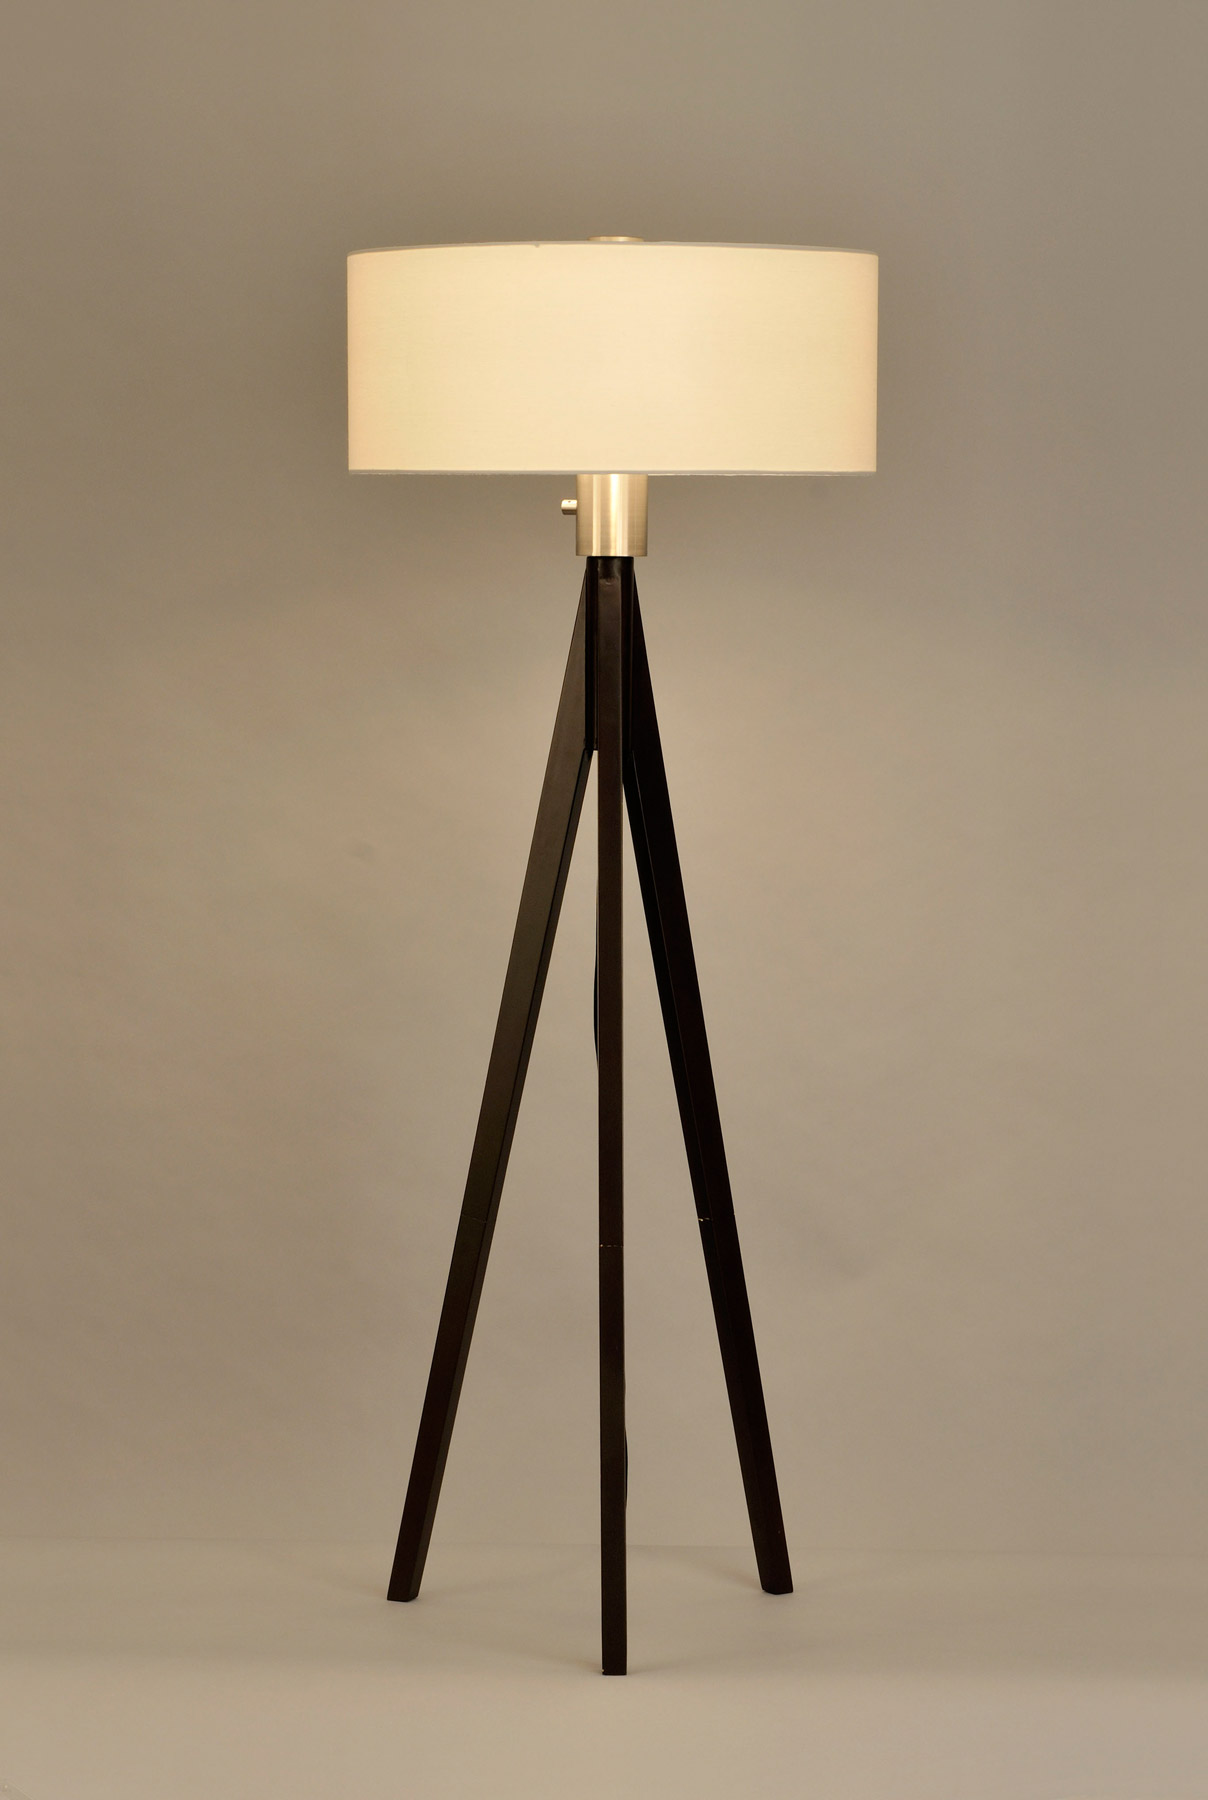 Nova Lighting 10858 Tripod Floor Lamp